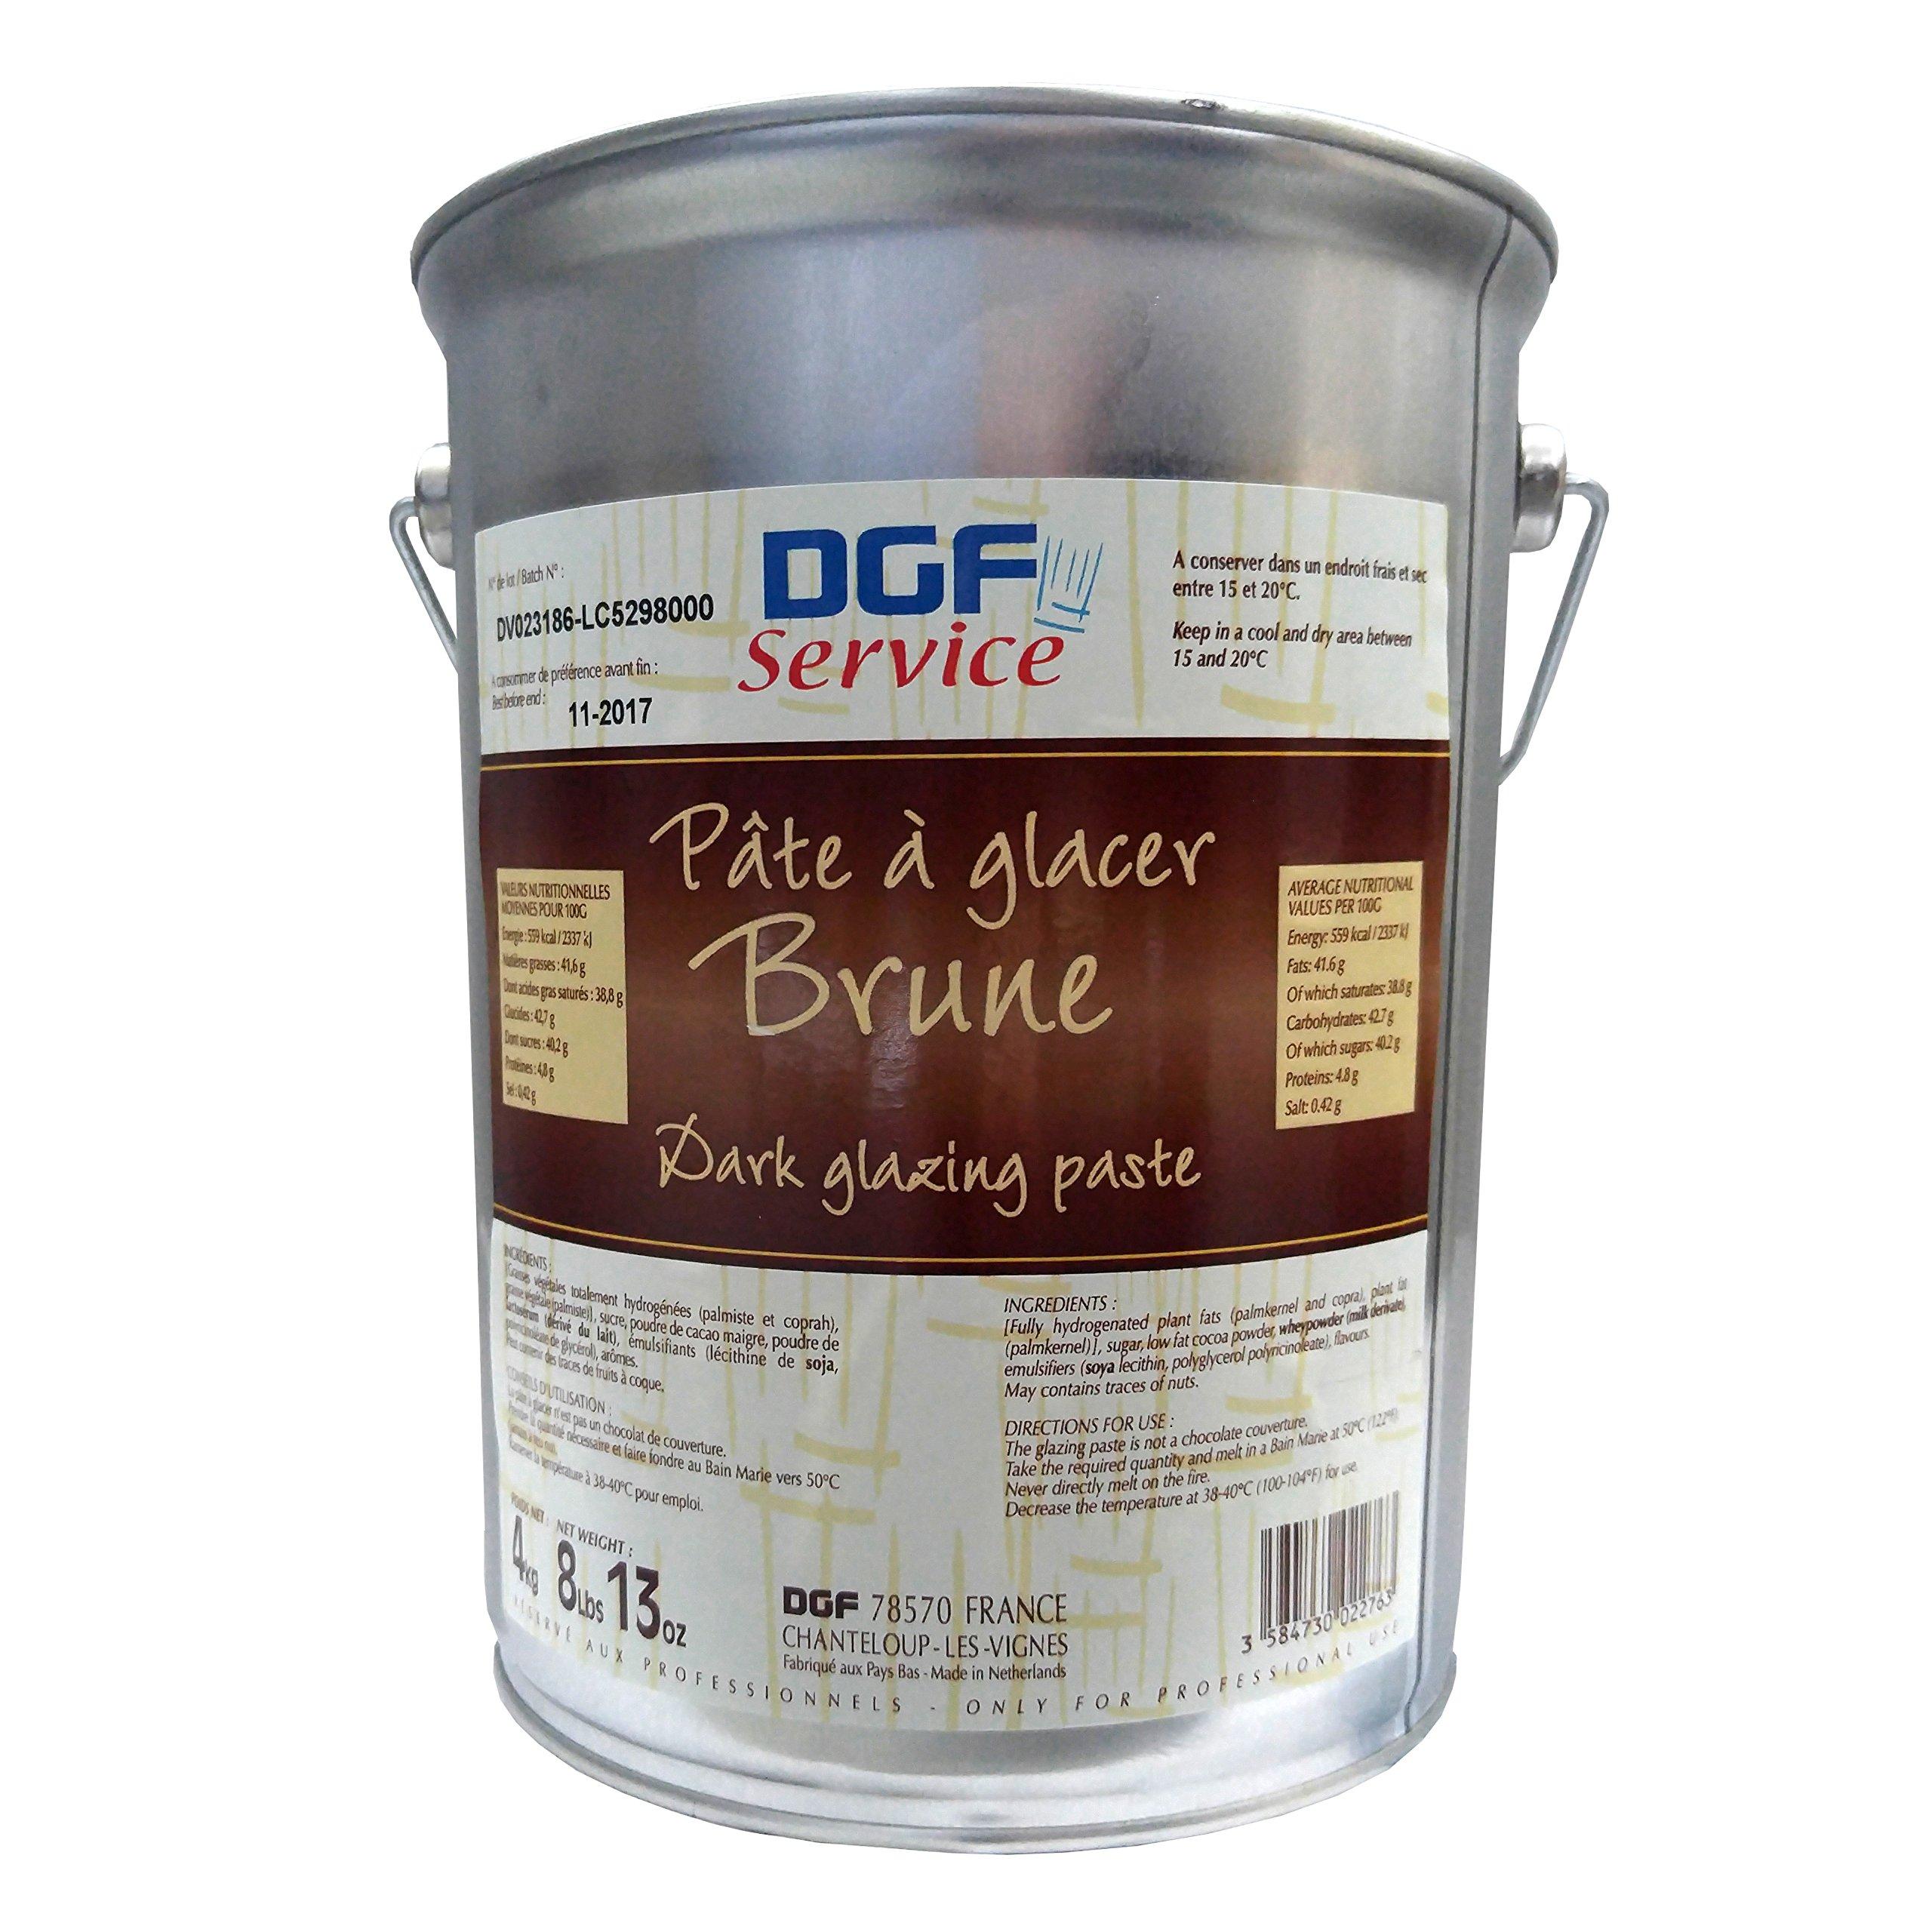 Pate A Glacer Brune, Dark Chocolate Glazing Paste - 8.8 Lb Pail